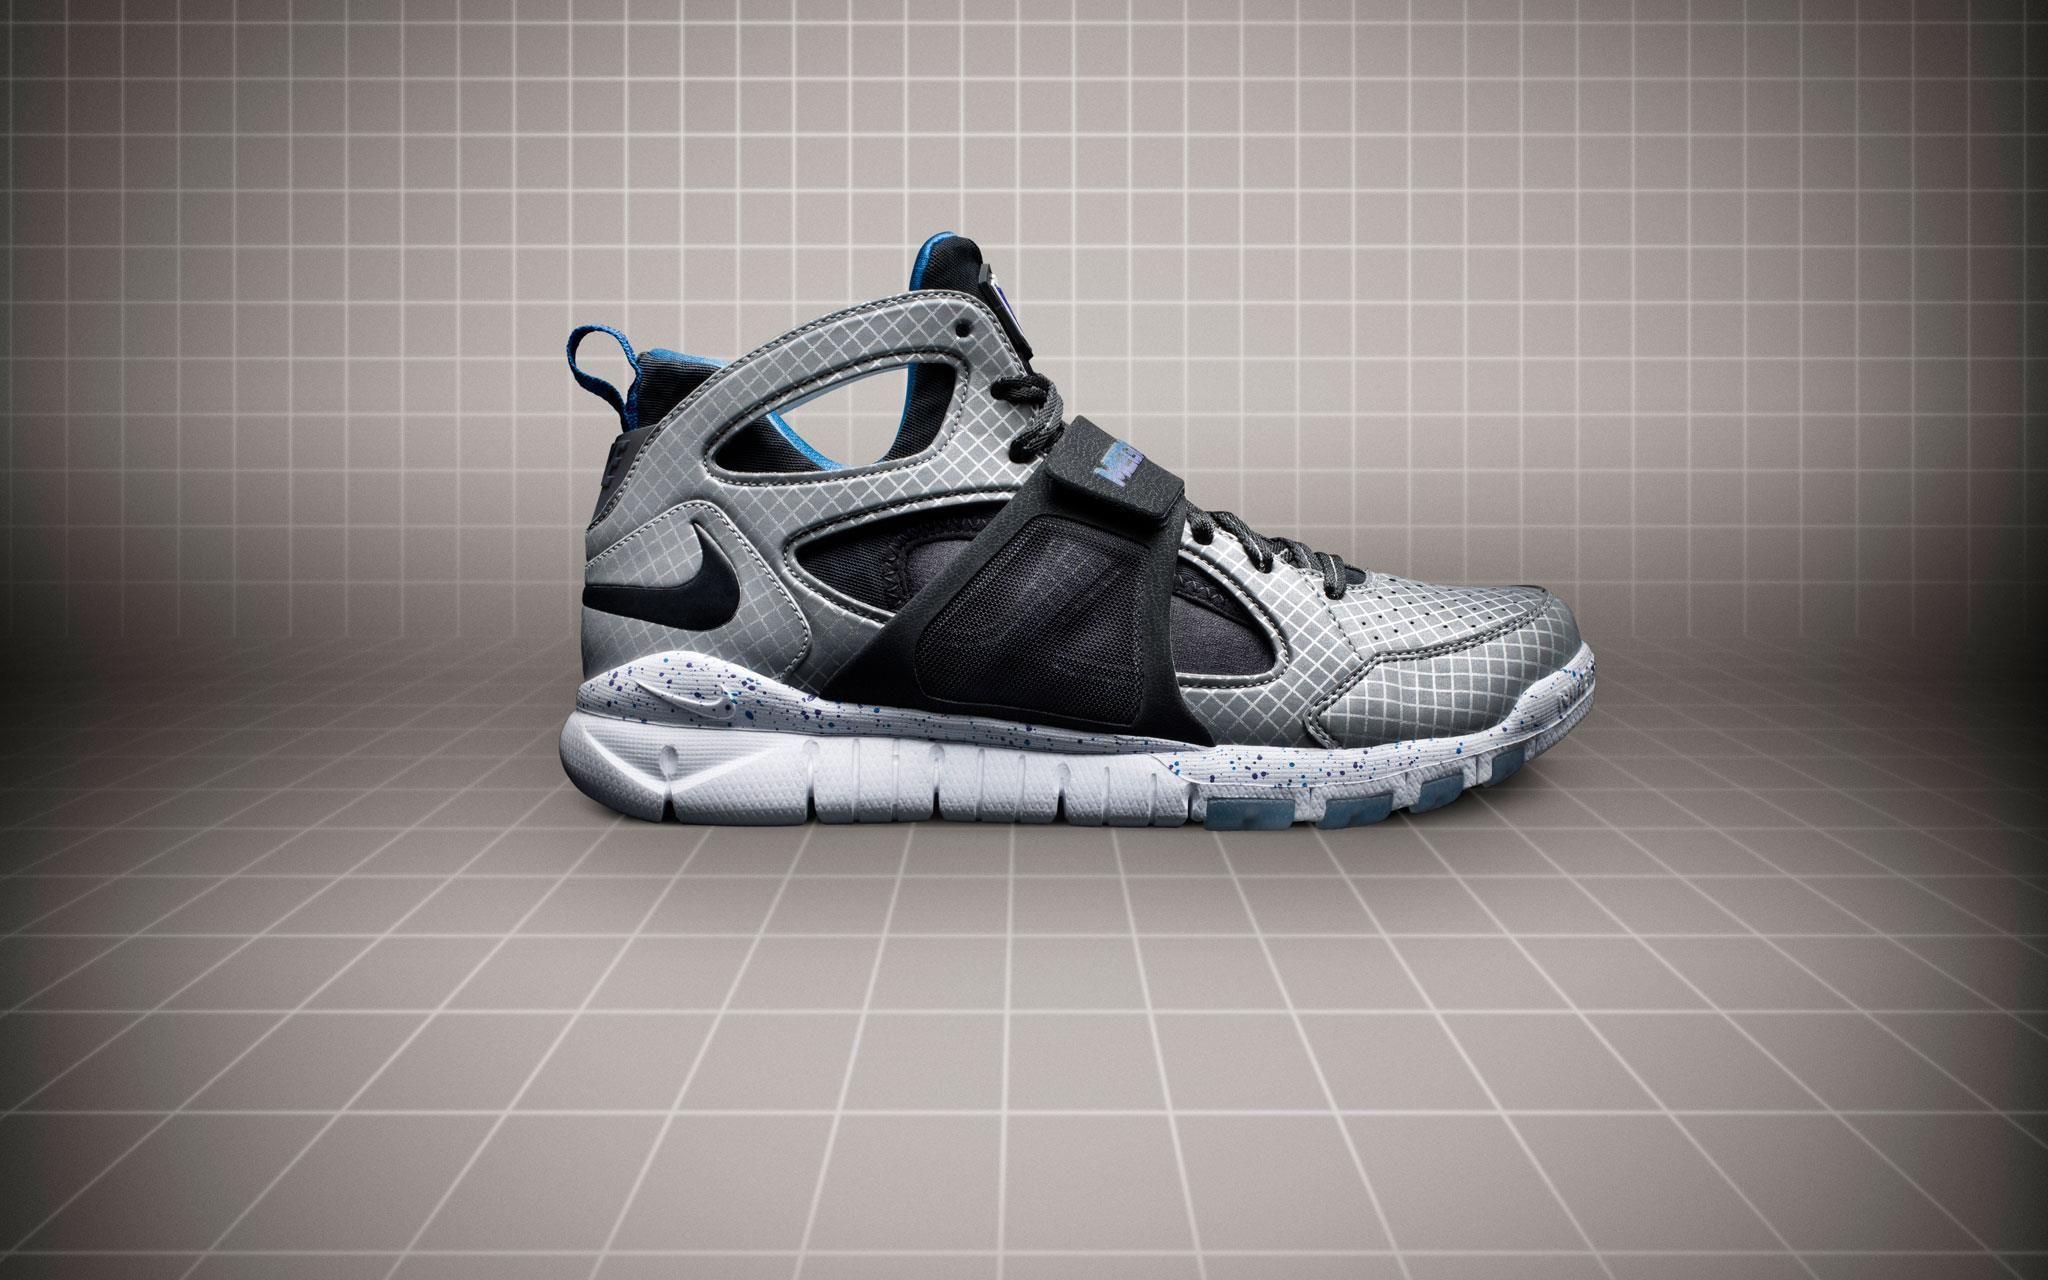 CJ81 Huarache Free Shield Nike Free Huarache Light 'Ultramarine' Nike Free Huarache Light - OG #mens #Nikes #running shoes #nike sneakers #nike shoes #nike for womens #nike frees #nike sneakers